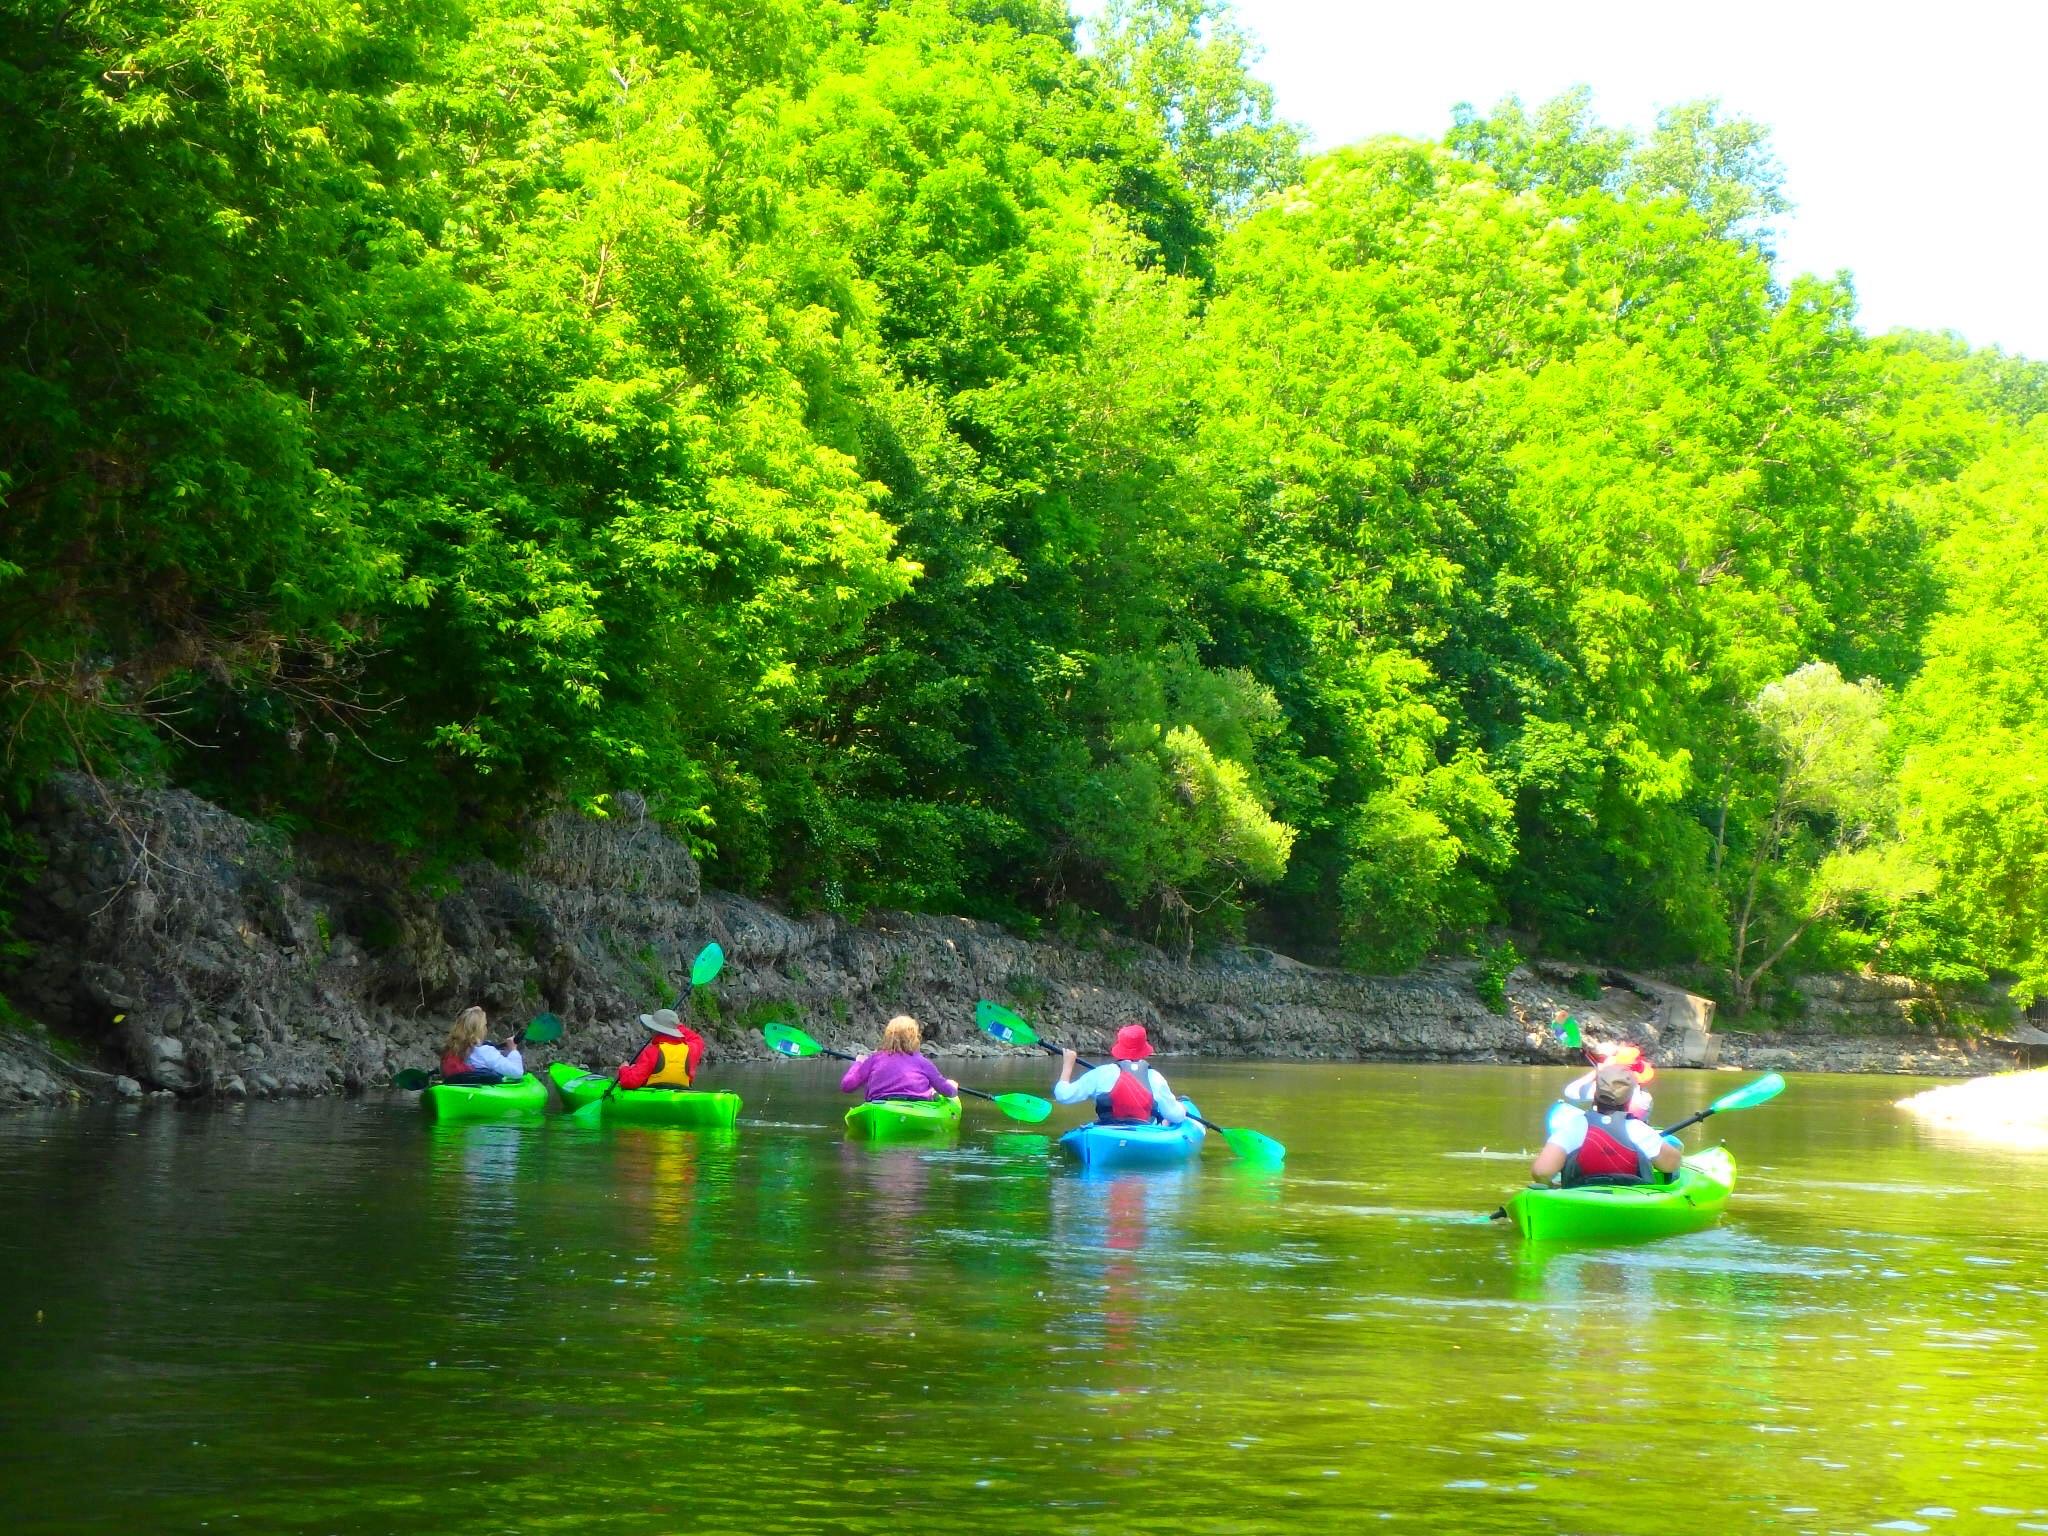 Kayaking Yoga Meditation - Solstice - Jun 21 2018-4